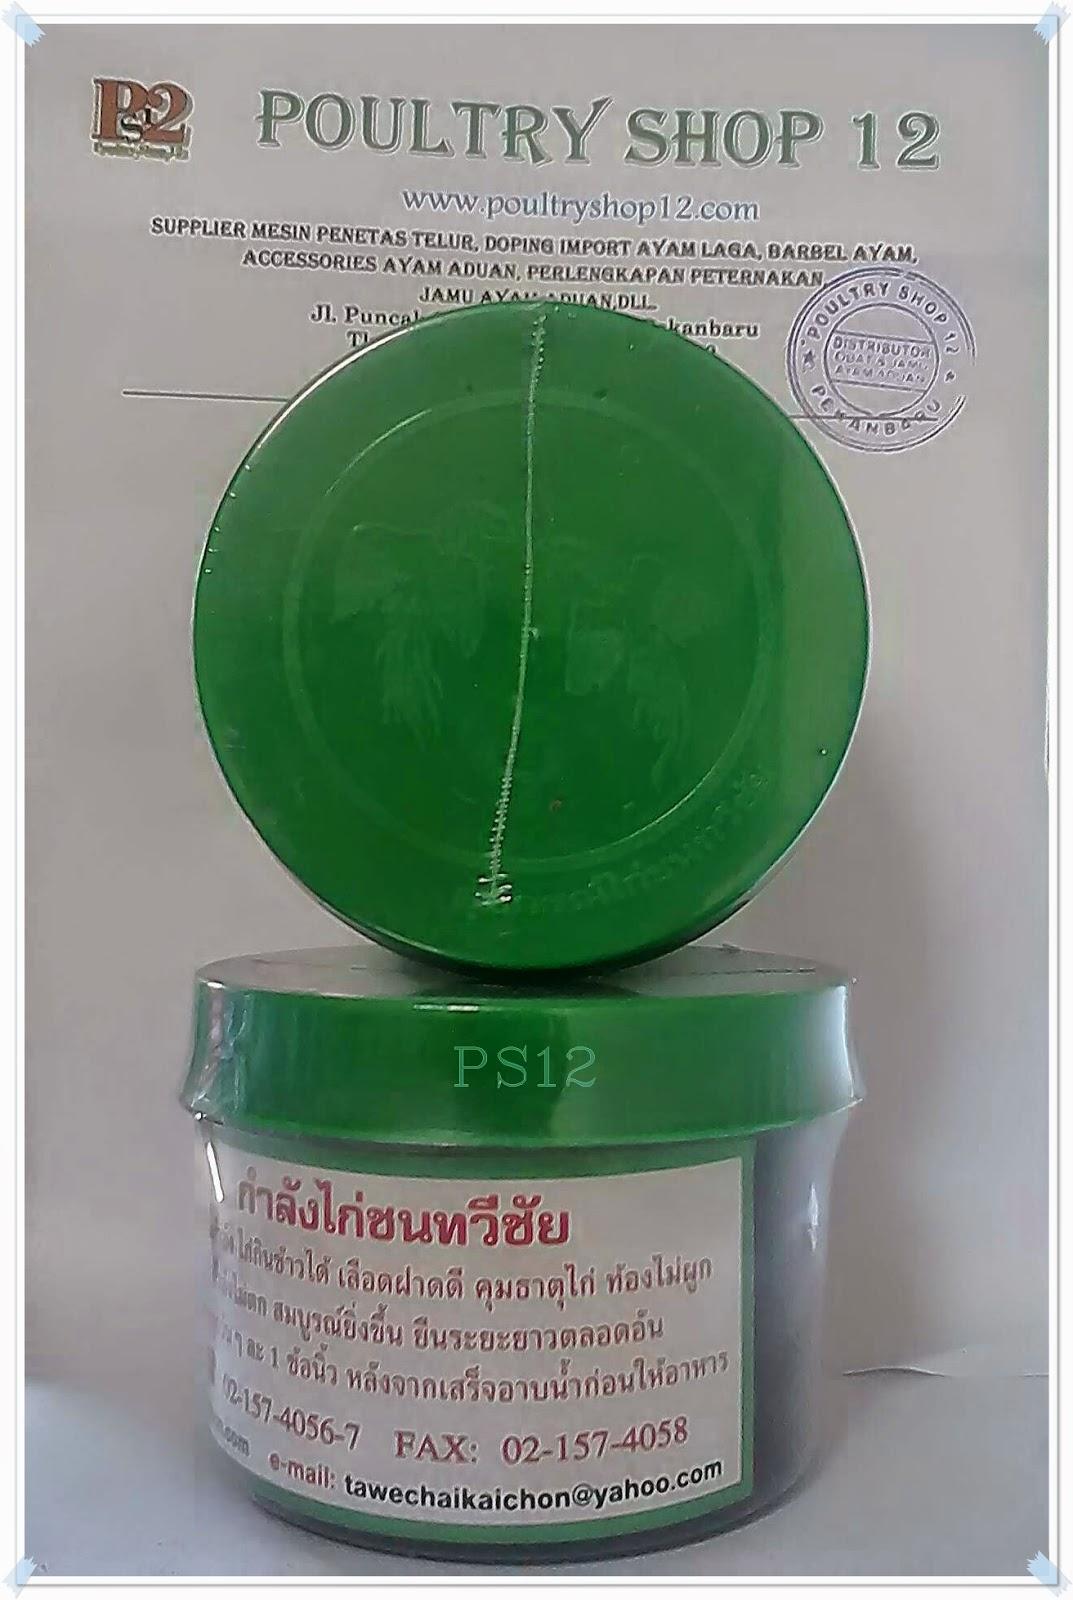 product asli,www.poultryshop.com, ps, ps 12 pekanbaru, www.ps12.com,